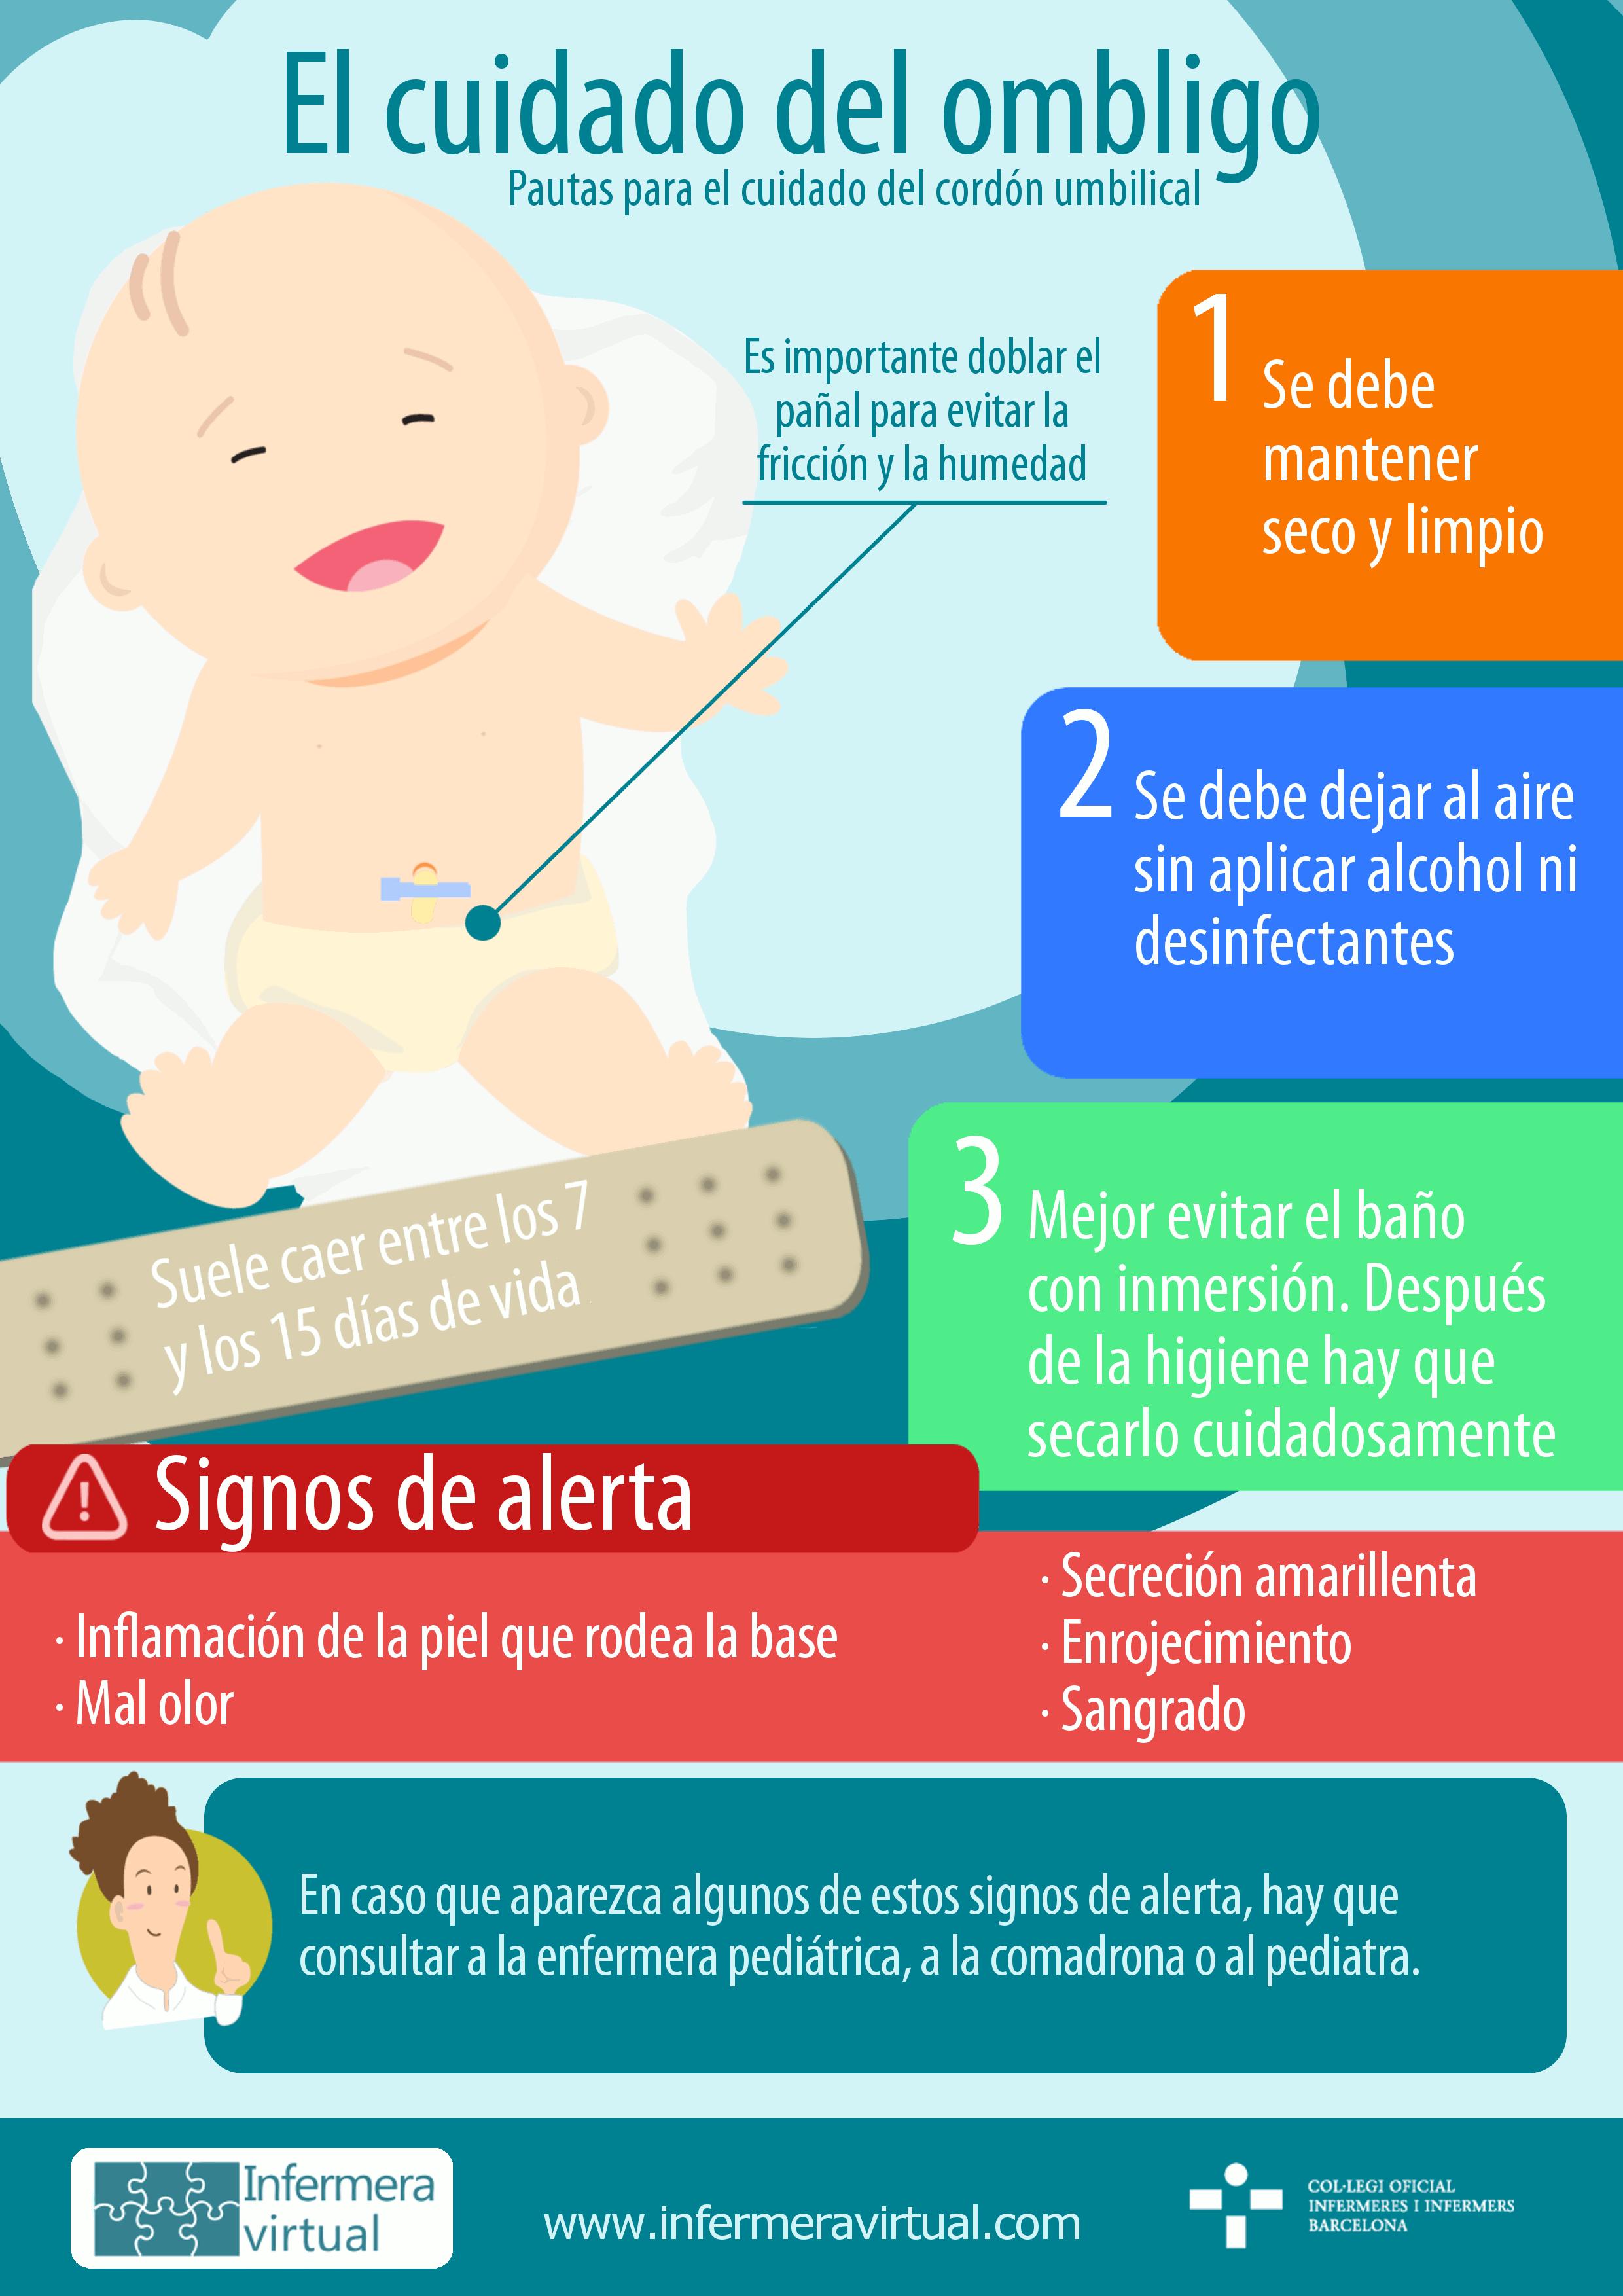 Infermeravirtual.com - Infancia, Situaciones de vida